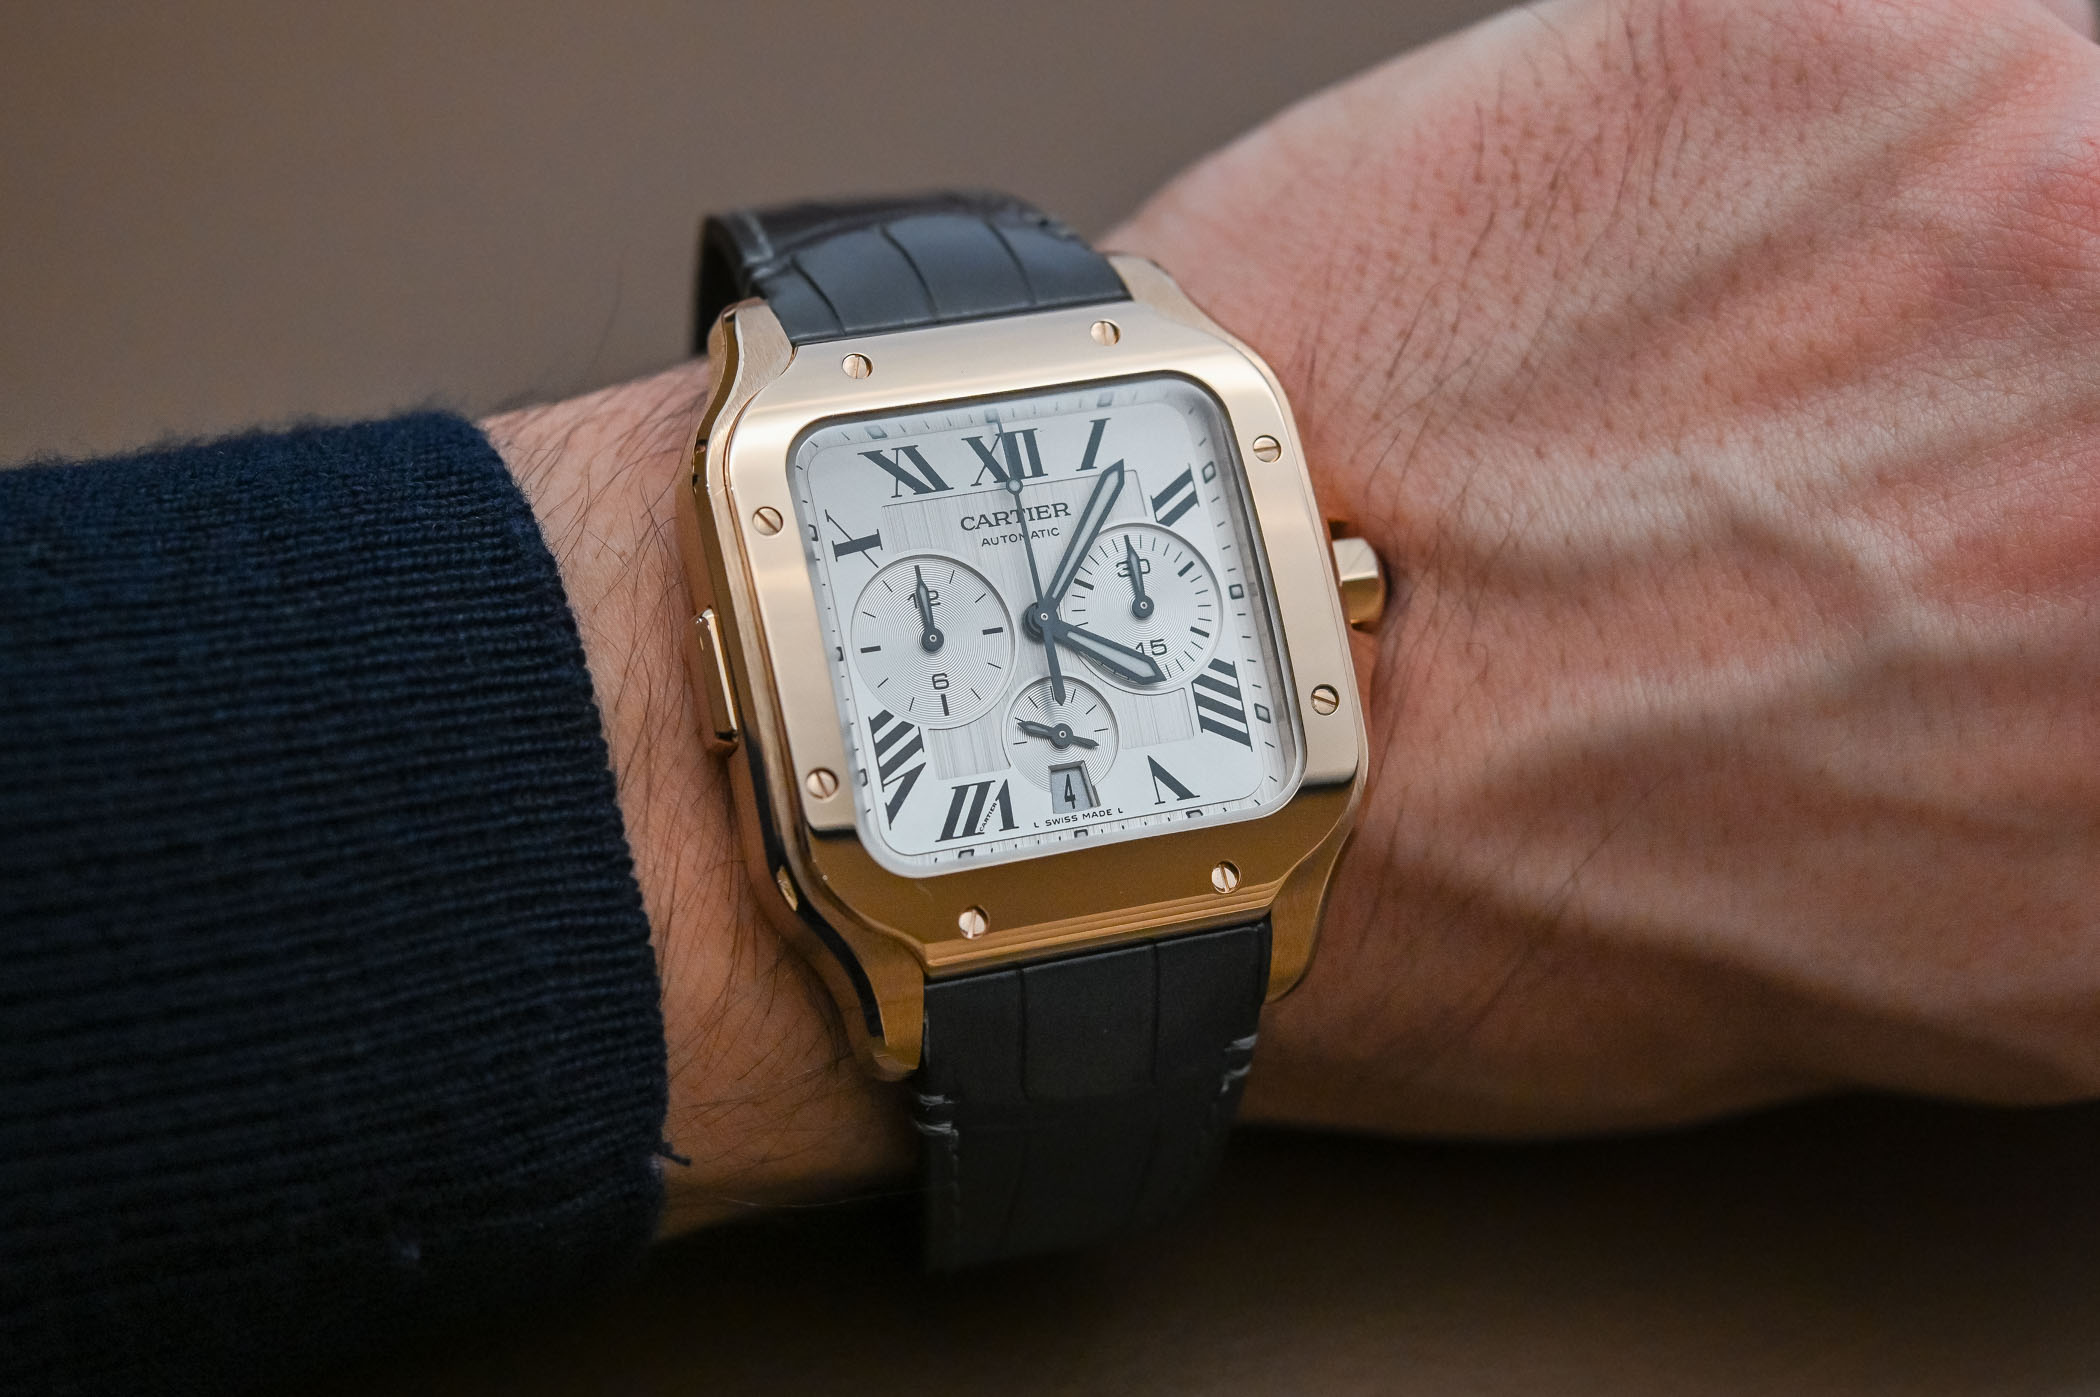 Hands On Review Santos De Cartier Chronograph Sihh 2019